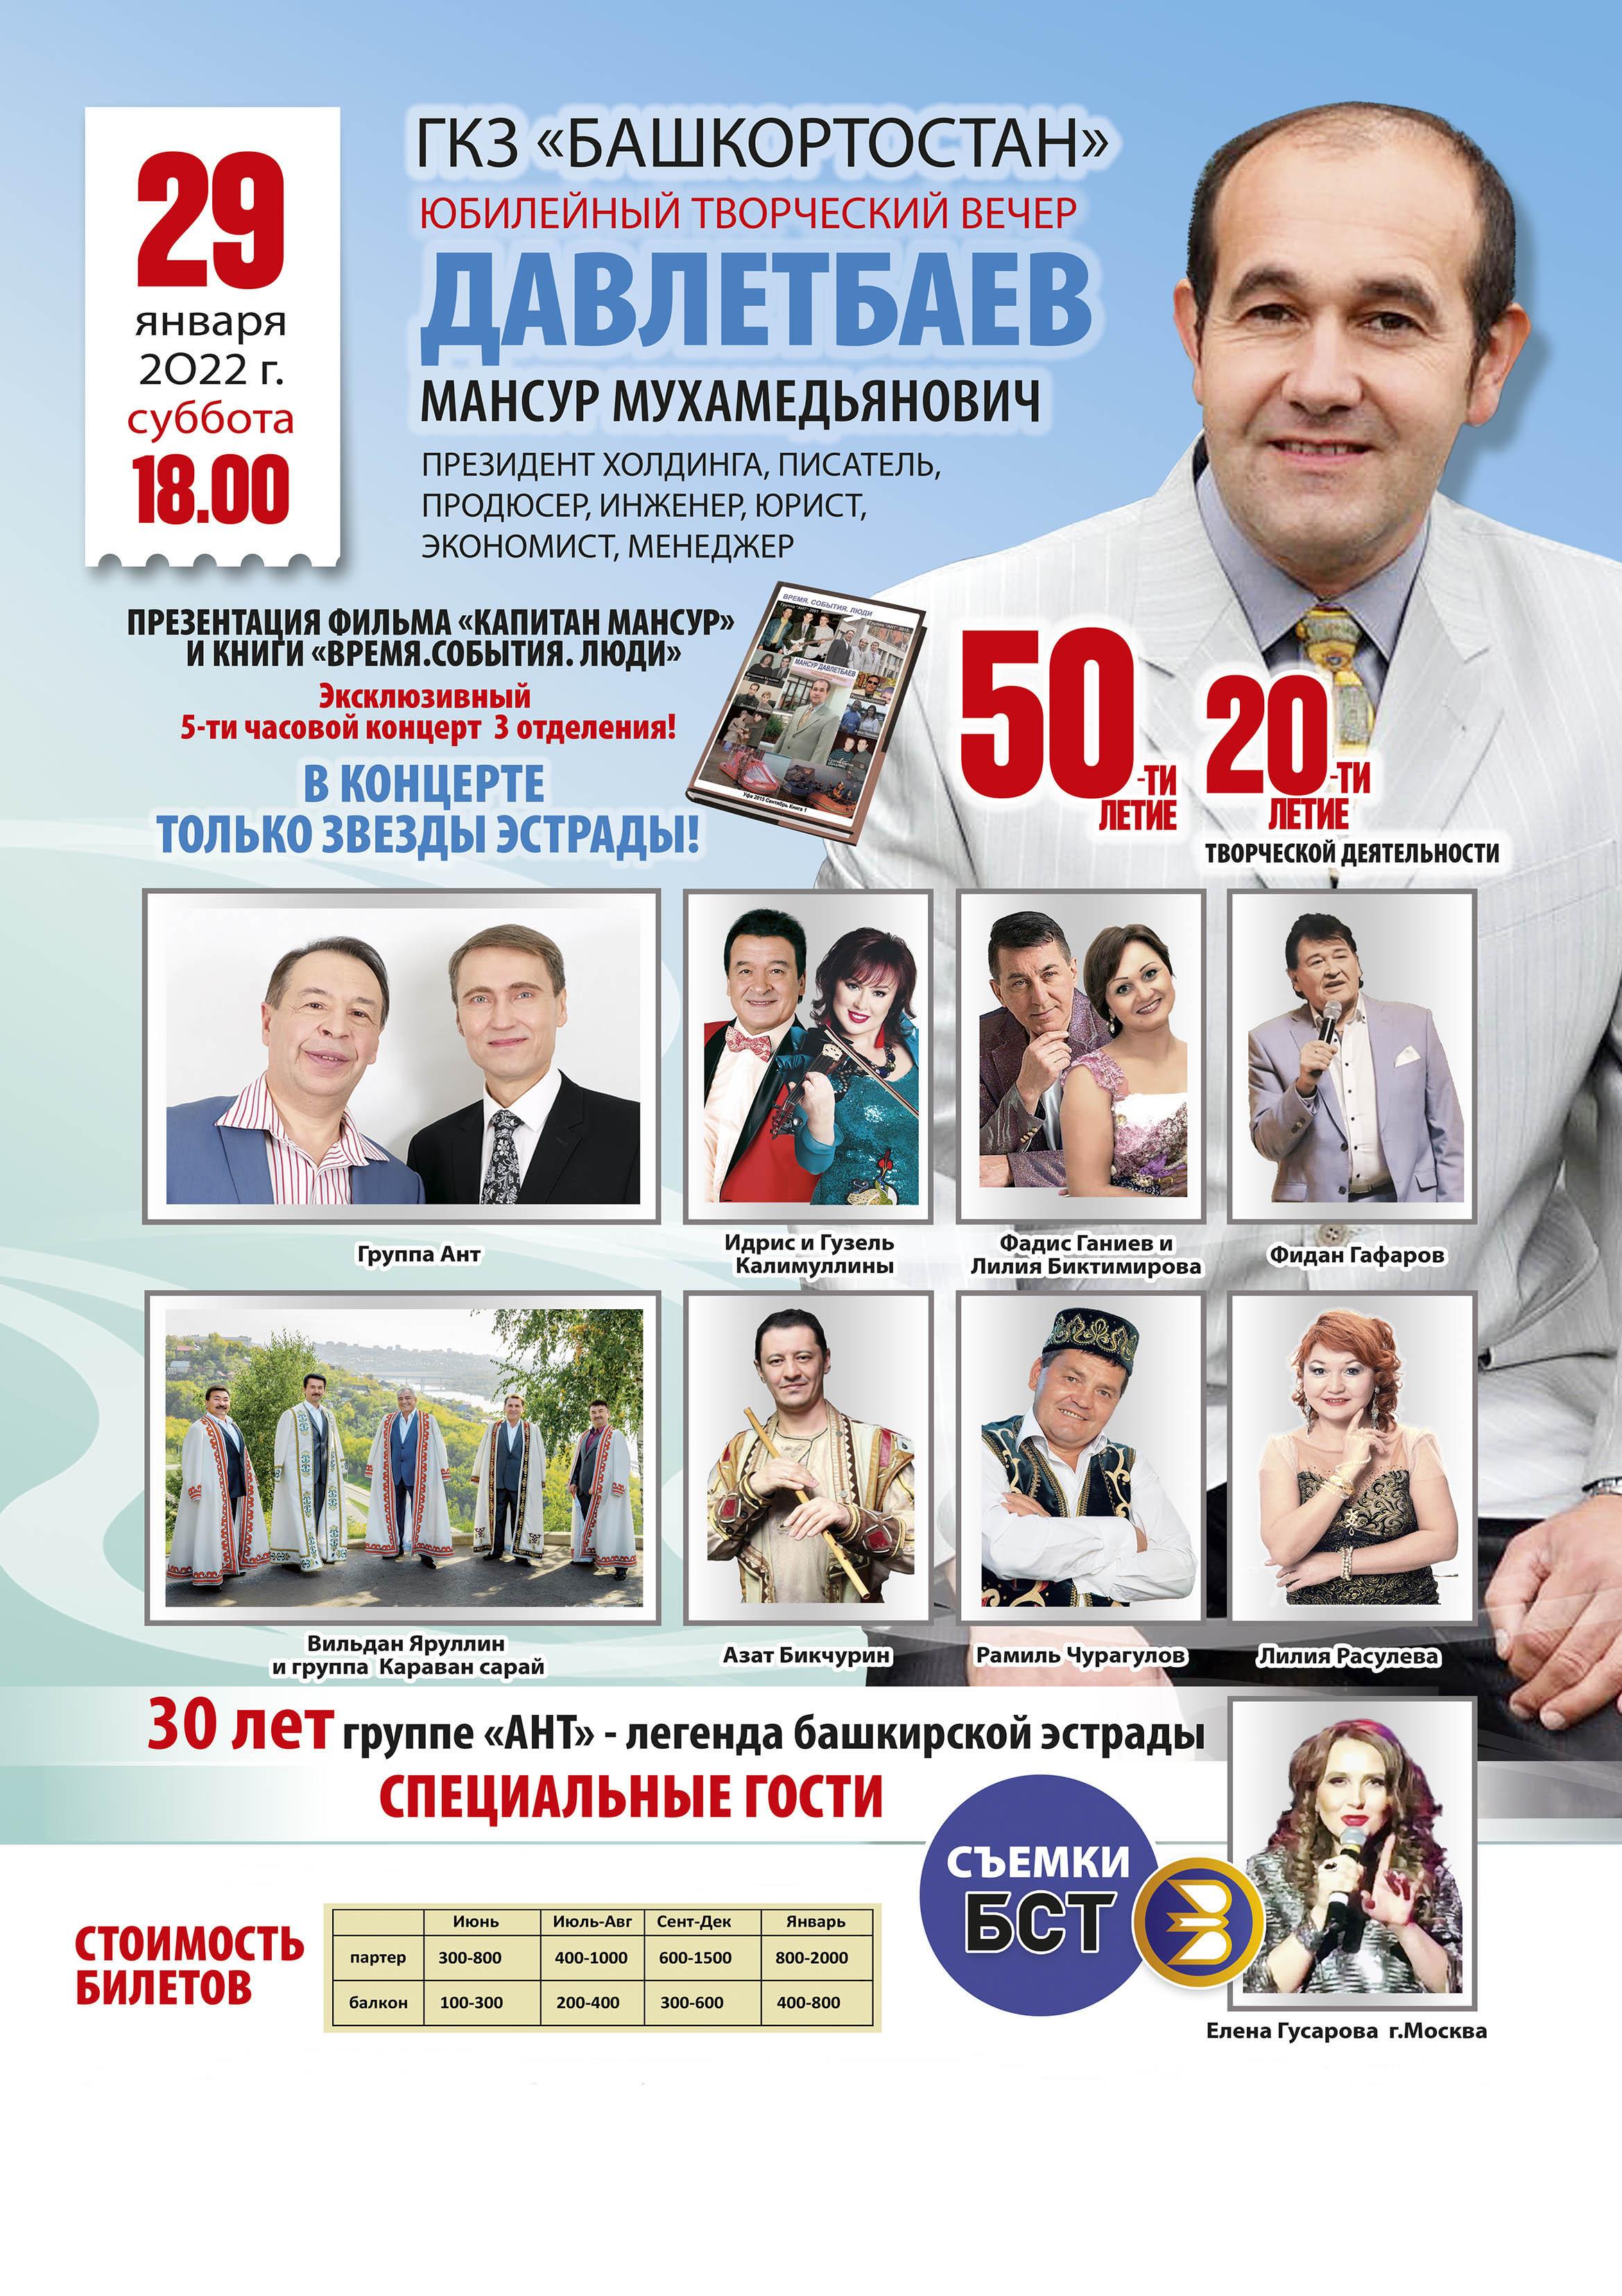 Давлетбаев Мансур Мухамедьянович. Юбилейный творческий вечер!